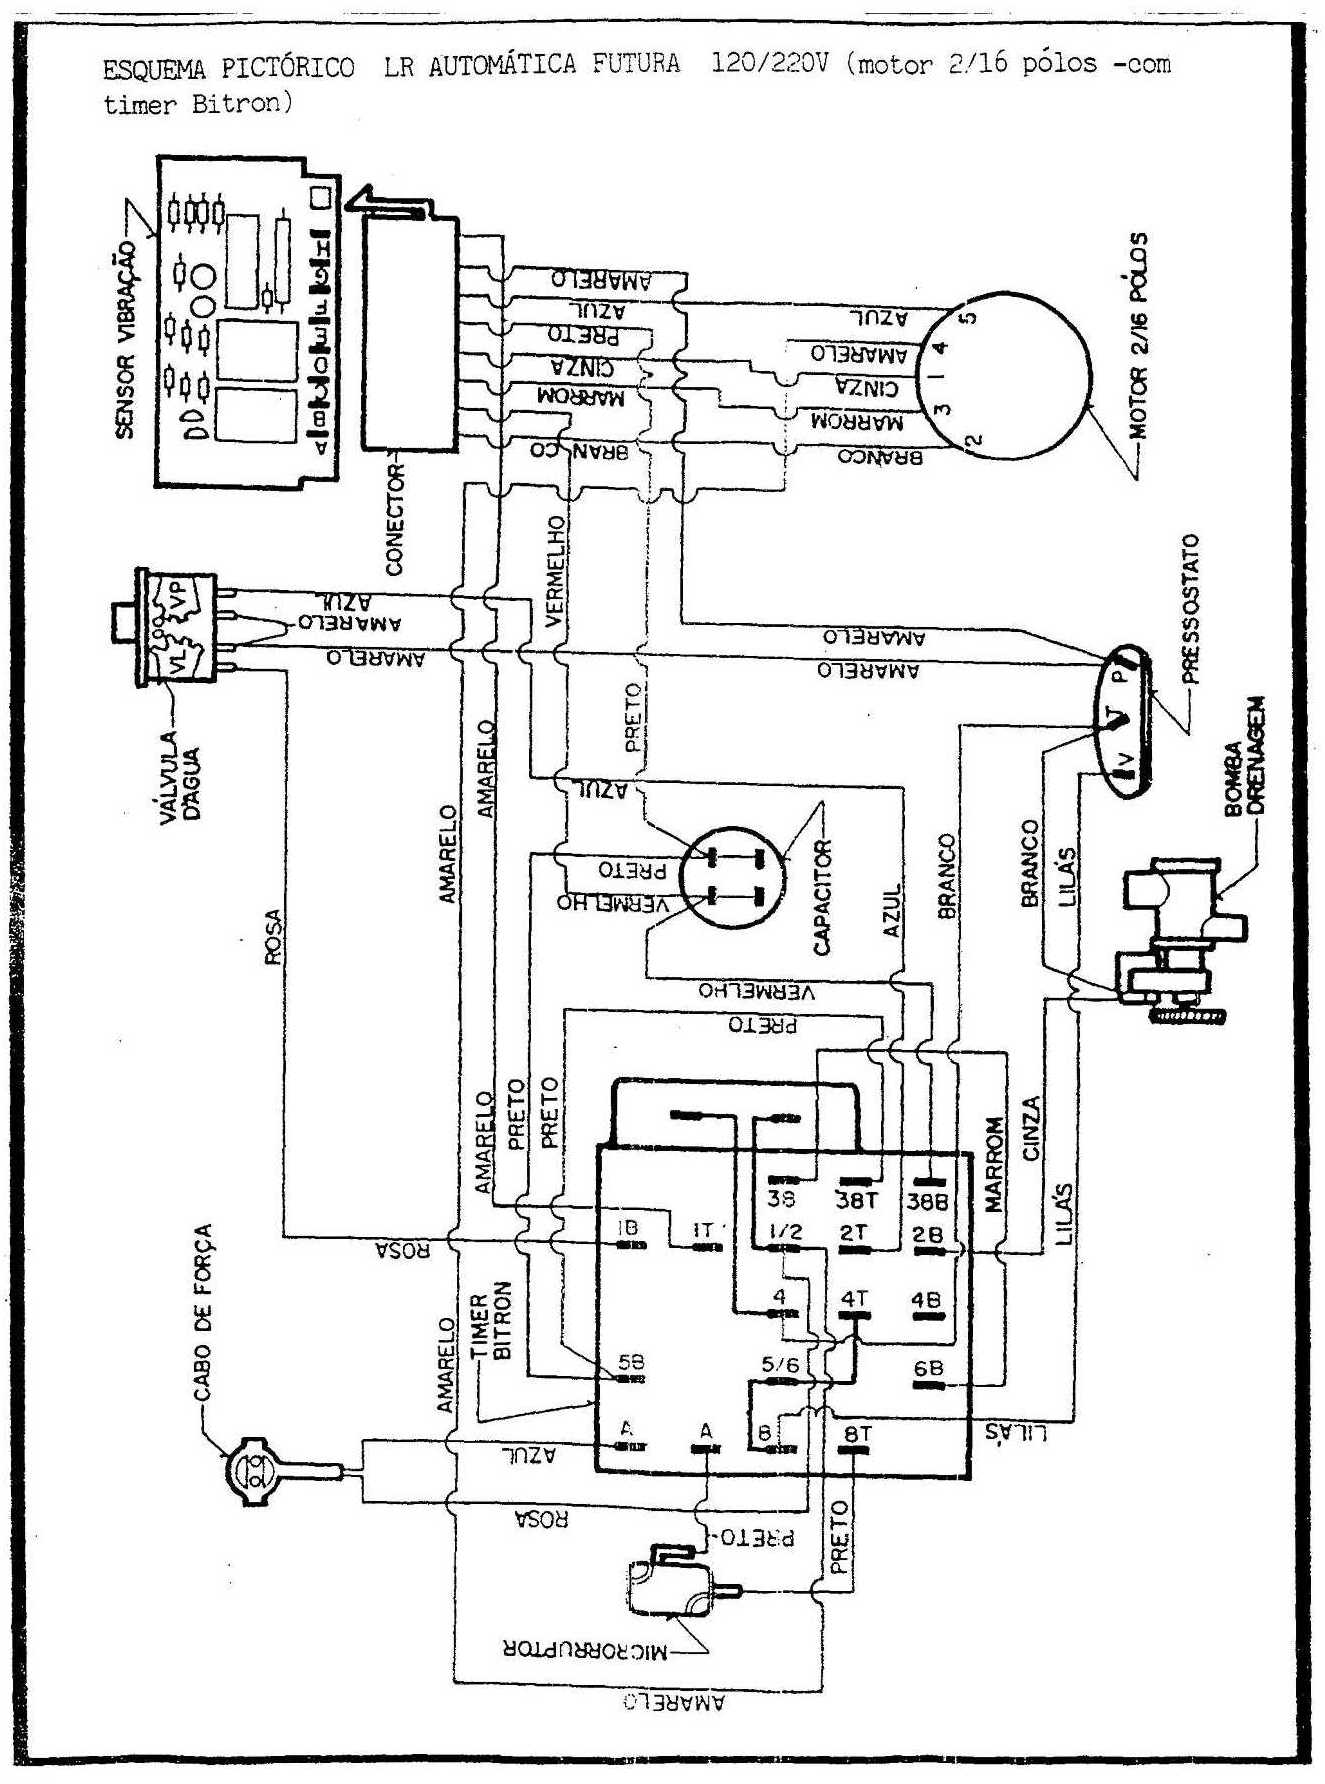 Daitsu Inverter Manual.Ar Condicionado Daitsu Inverter